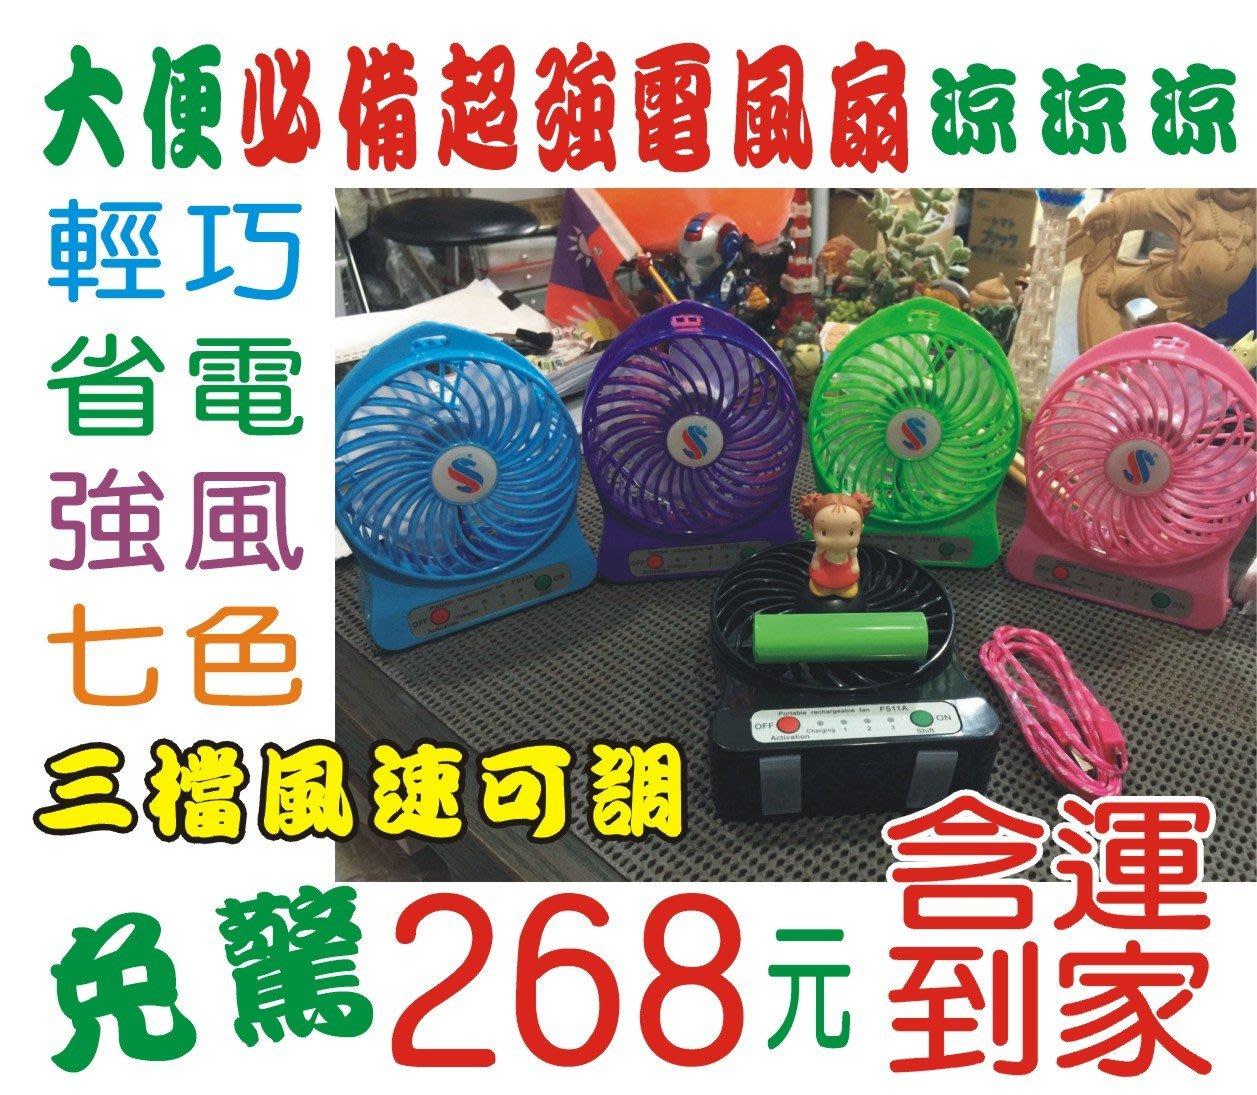 5mj.tw USB迷你電風扇充電 迷你辦公室 風扇 超靜音 小電扇 冷氣 冰涼巾 i6 9h插頭也可充電